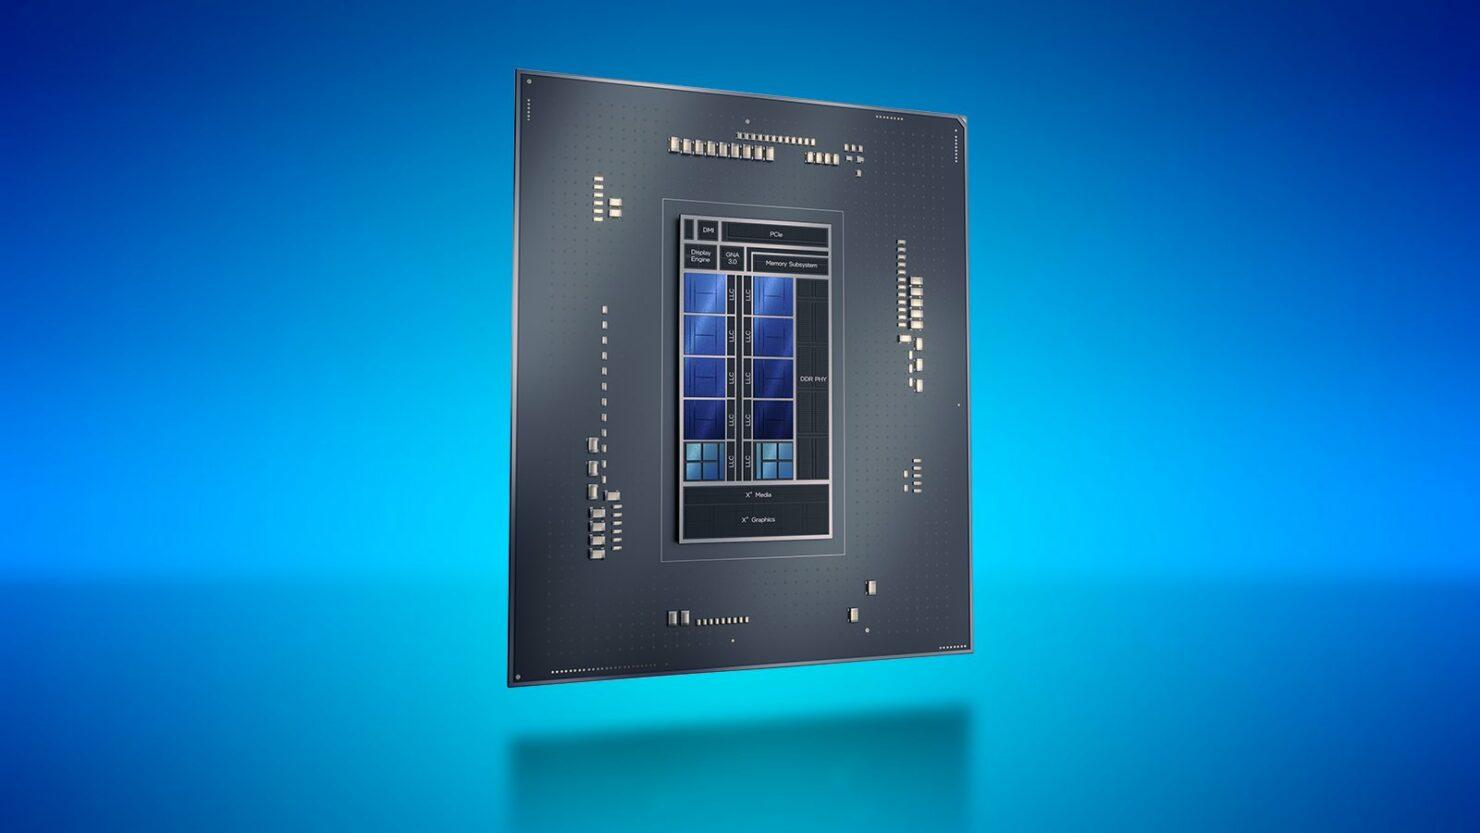 intel-core-i5-12600k-cpu-performance-&-pricing-rumors:-faster-than-ryzen-7-5800x-in-gaming-&-multi-threading-at-ryzen-5-5600x-pricing